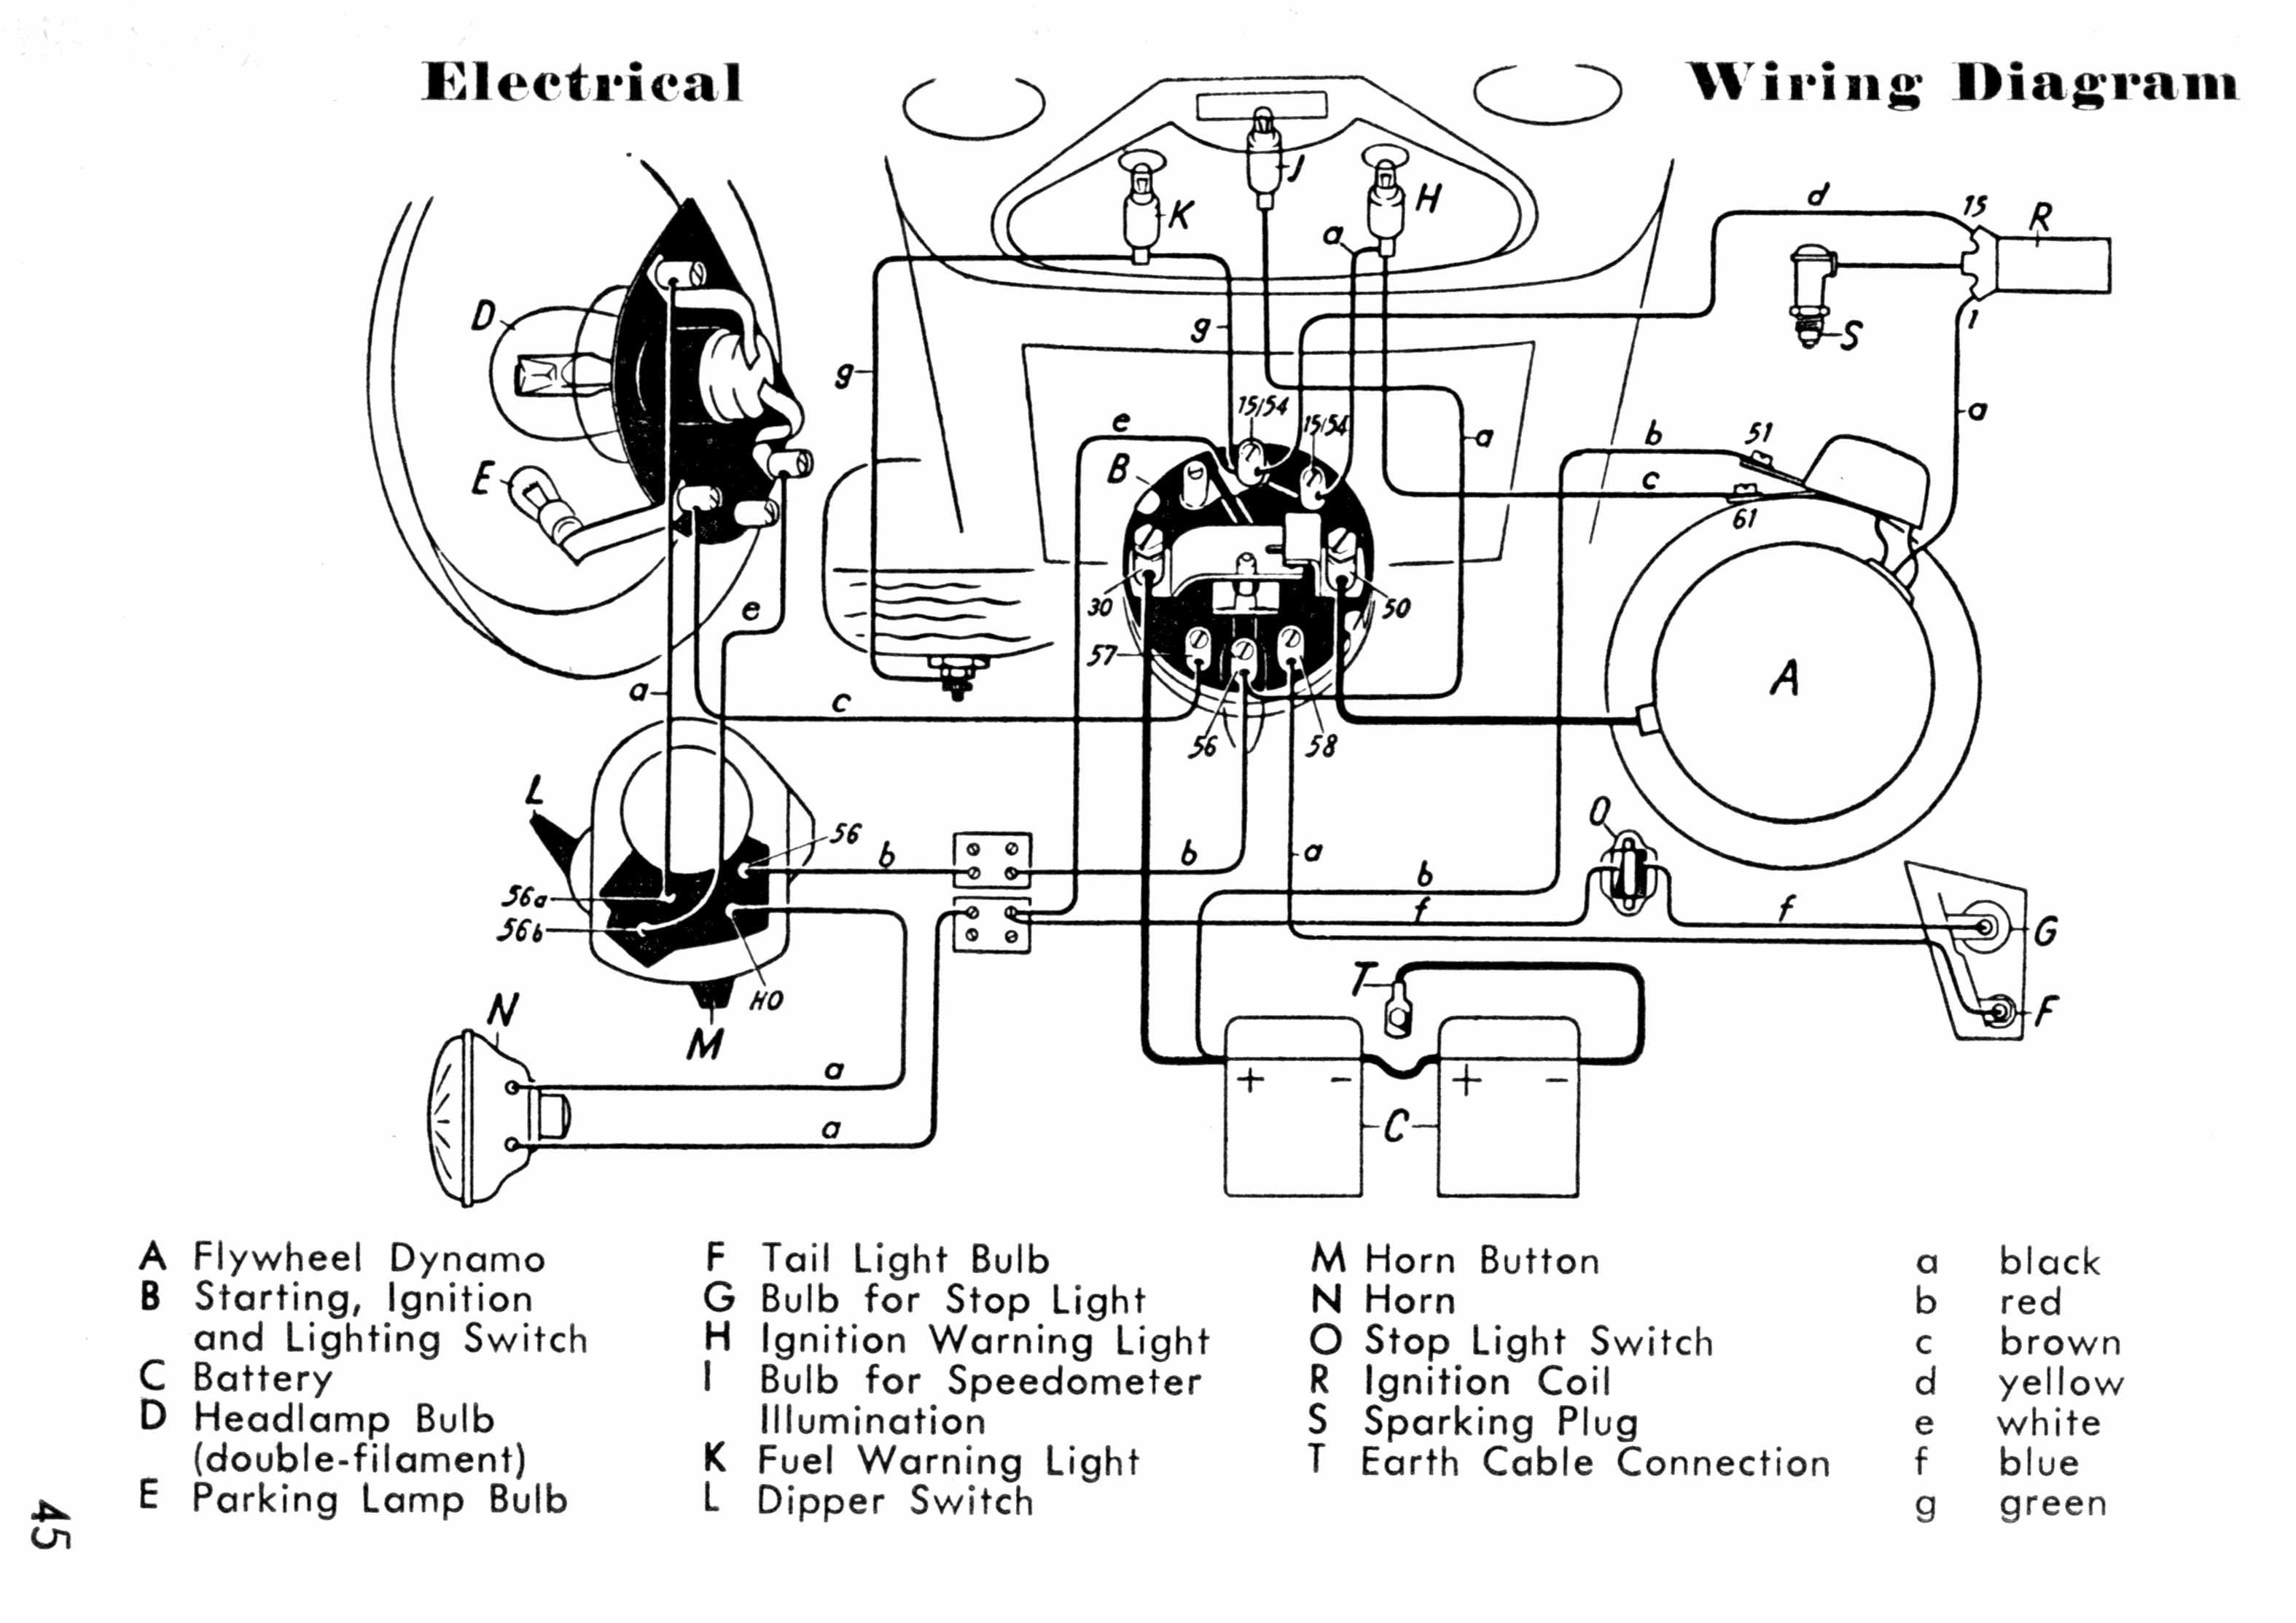 Tdpro 24v 500w Wiring Diagram